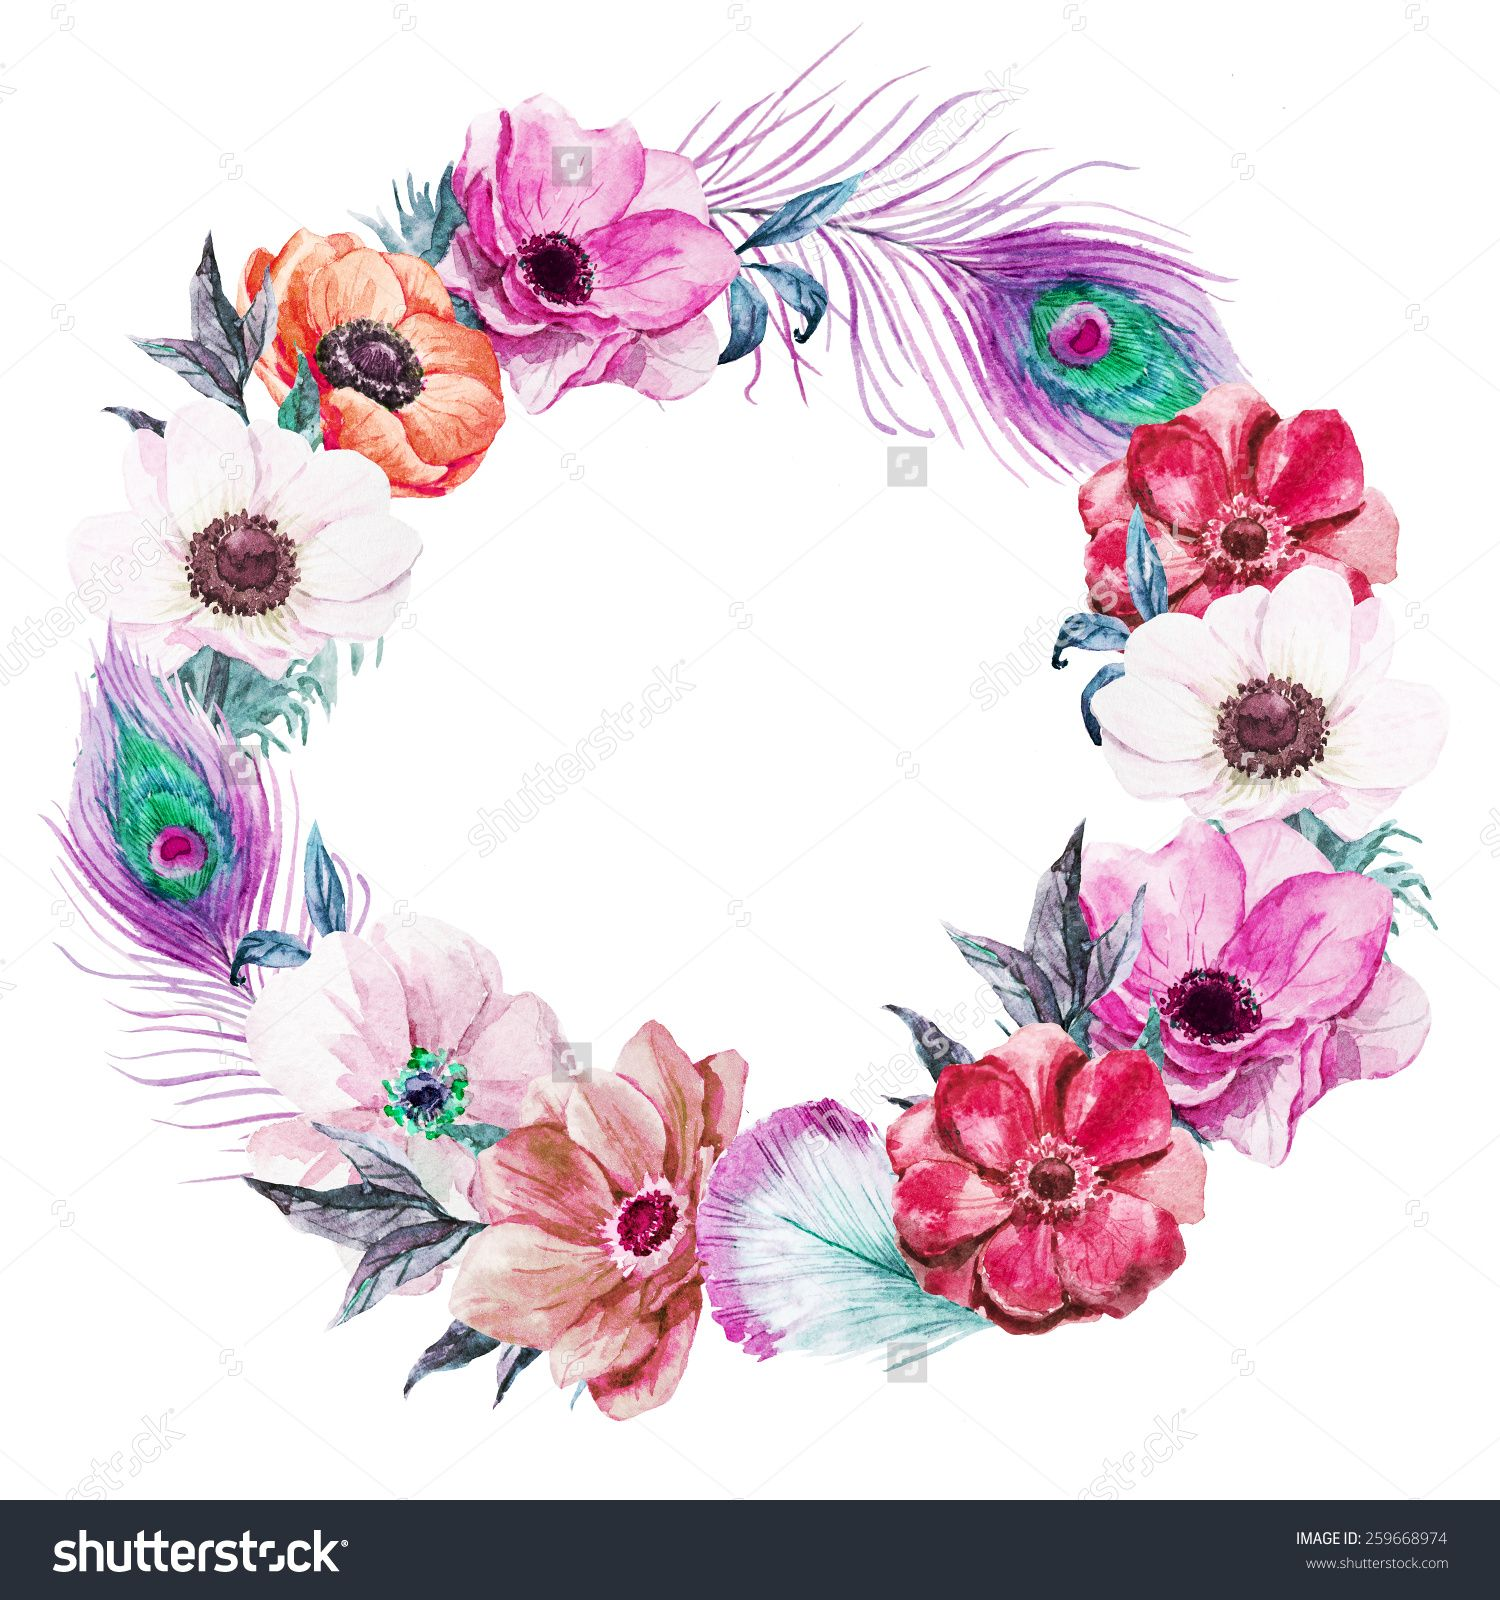 Black Flower Watercolor Art By Tae Lee: Boho Wreath Clipart - ClipartFest